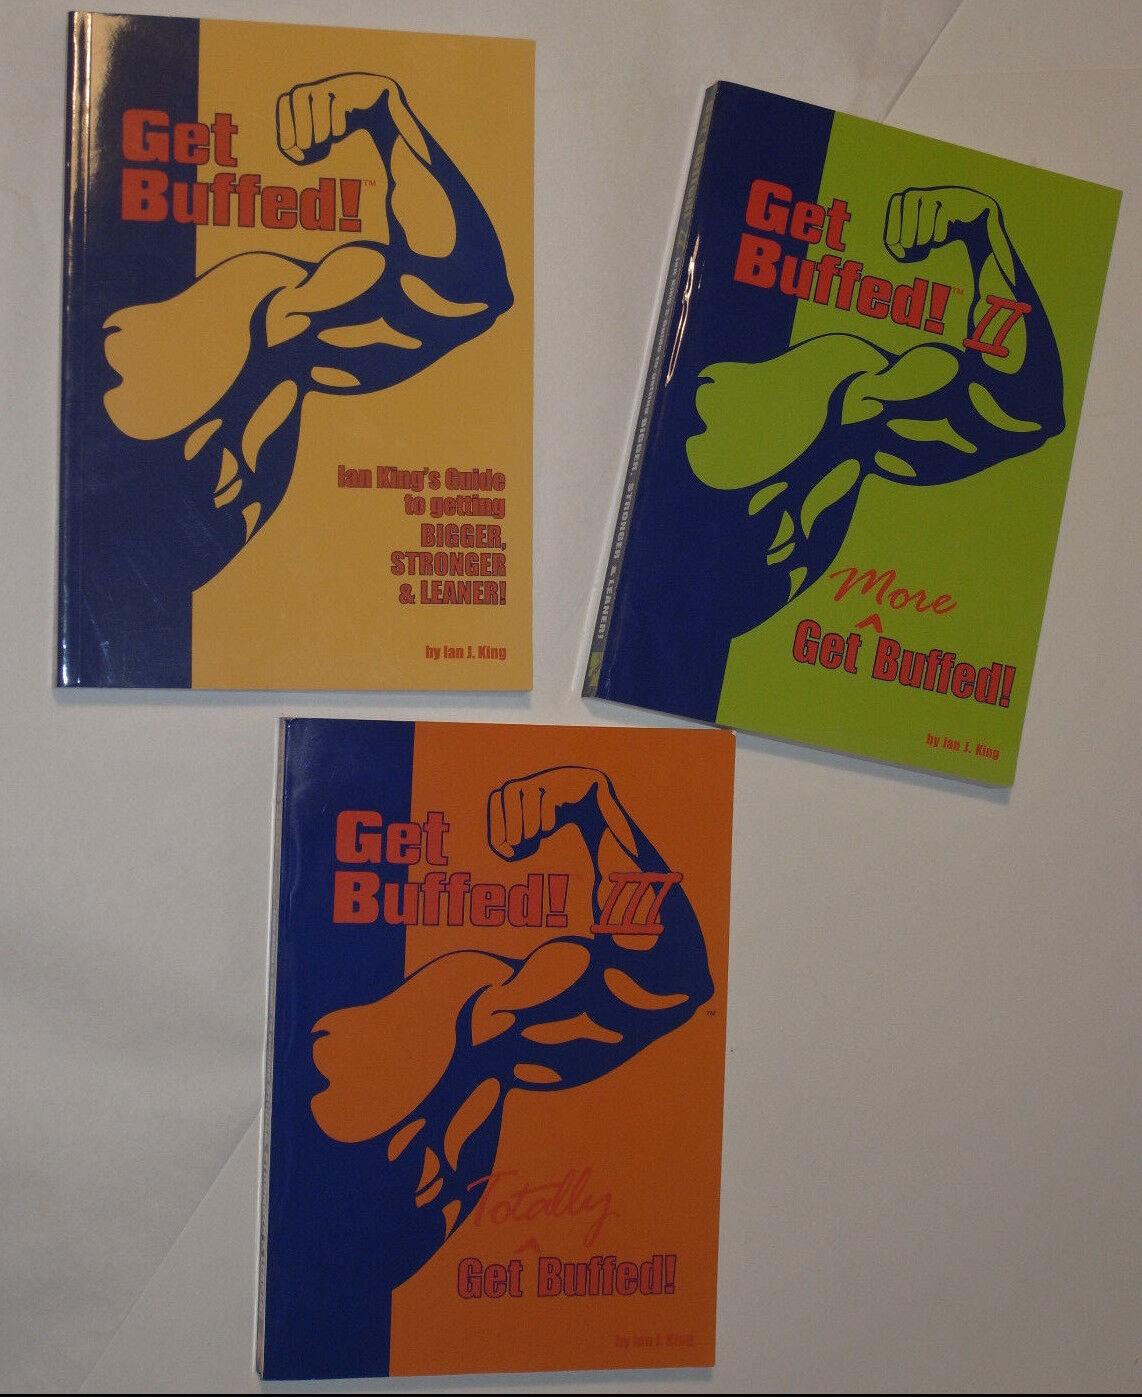 GET BUFFED  I, II & III ALL 3 VOLUMES  IAN KING'S GUIDE GETTING BIGGER, STRONGER